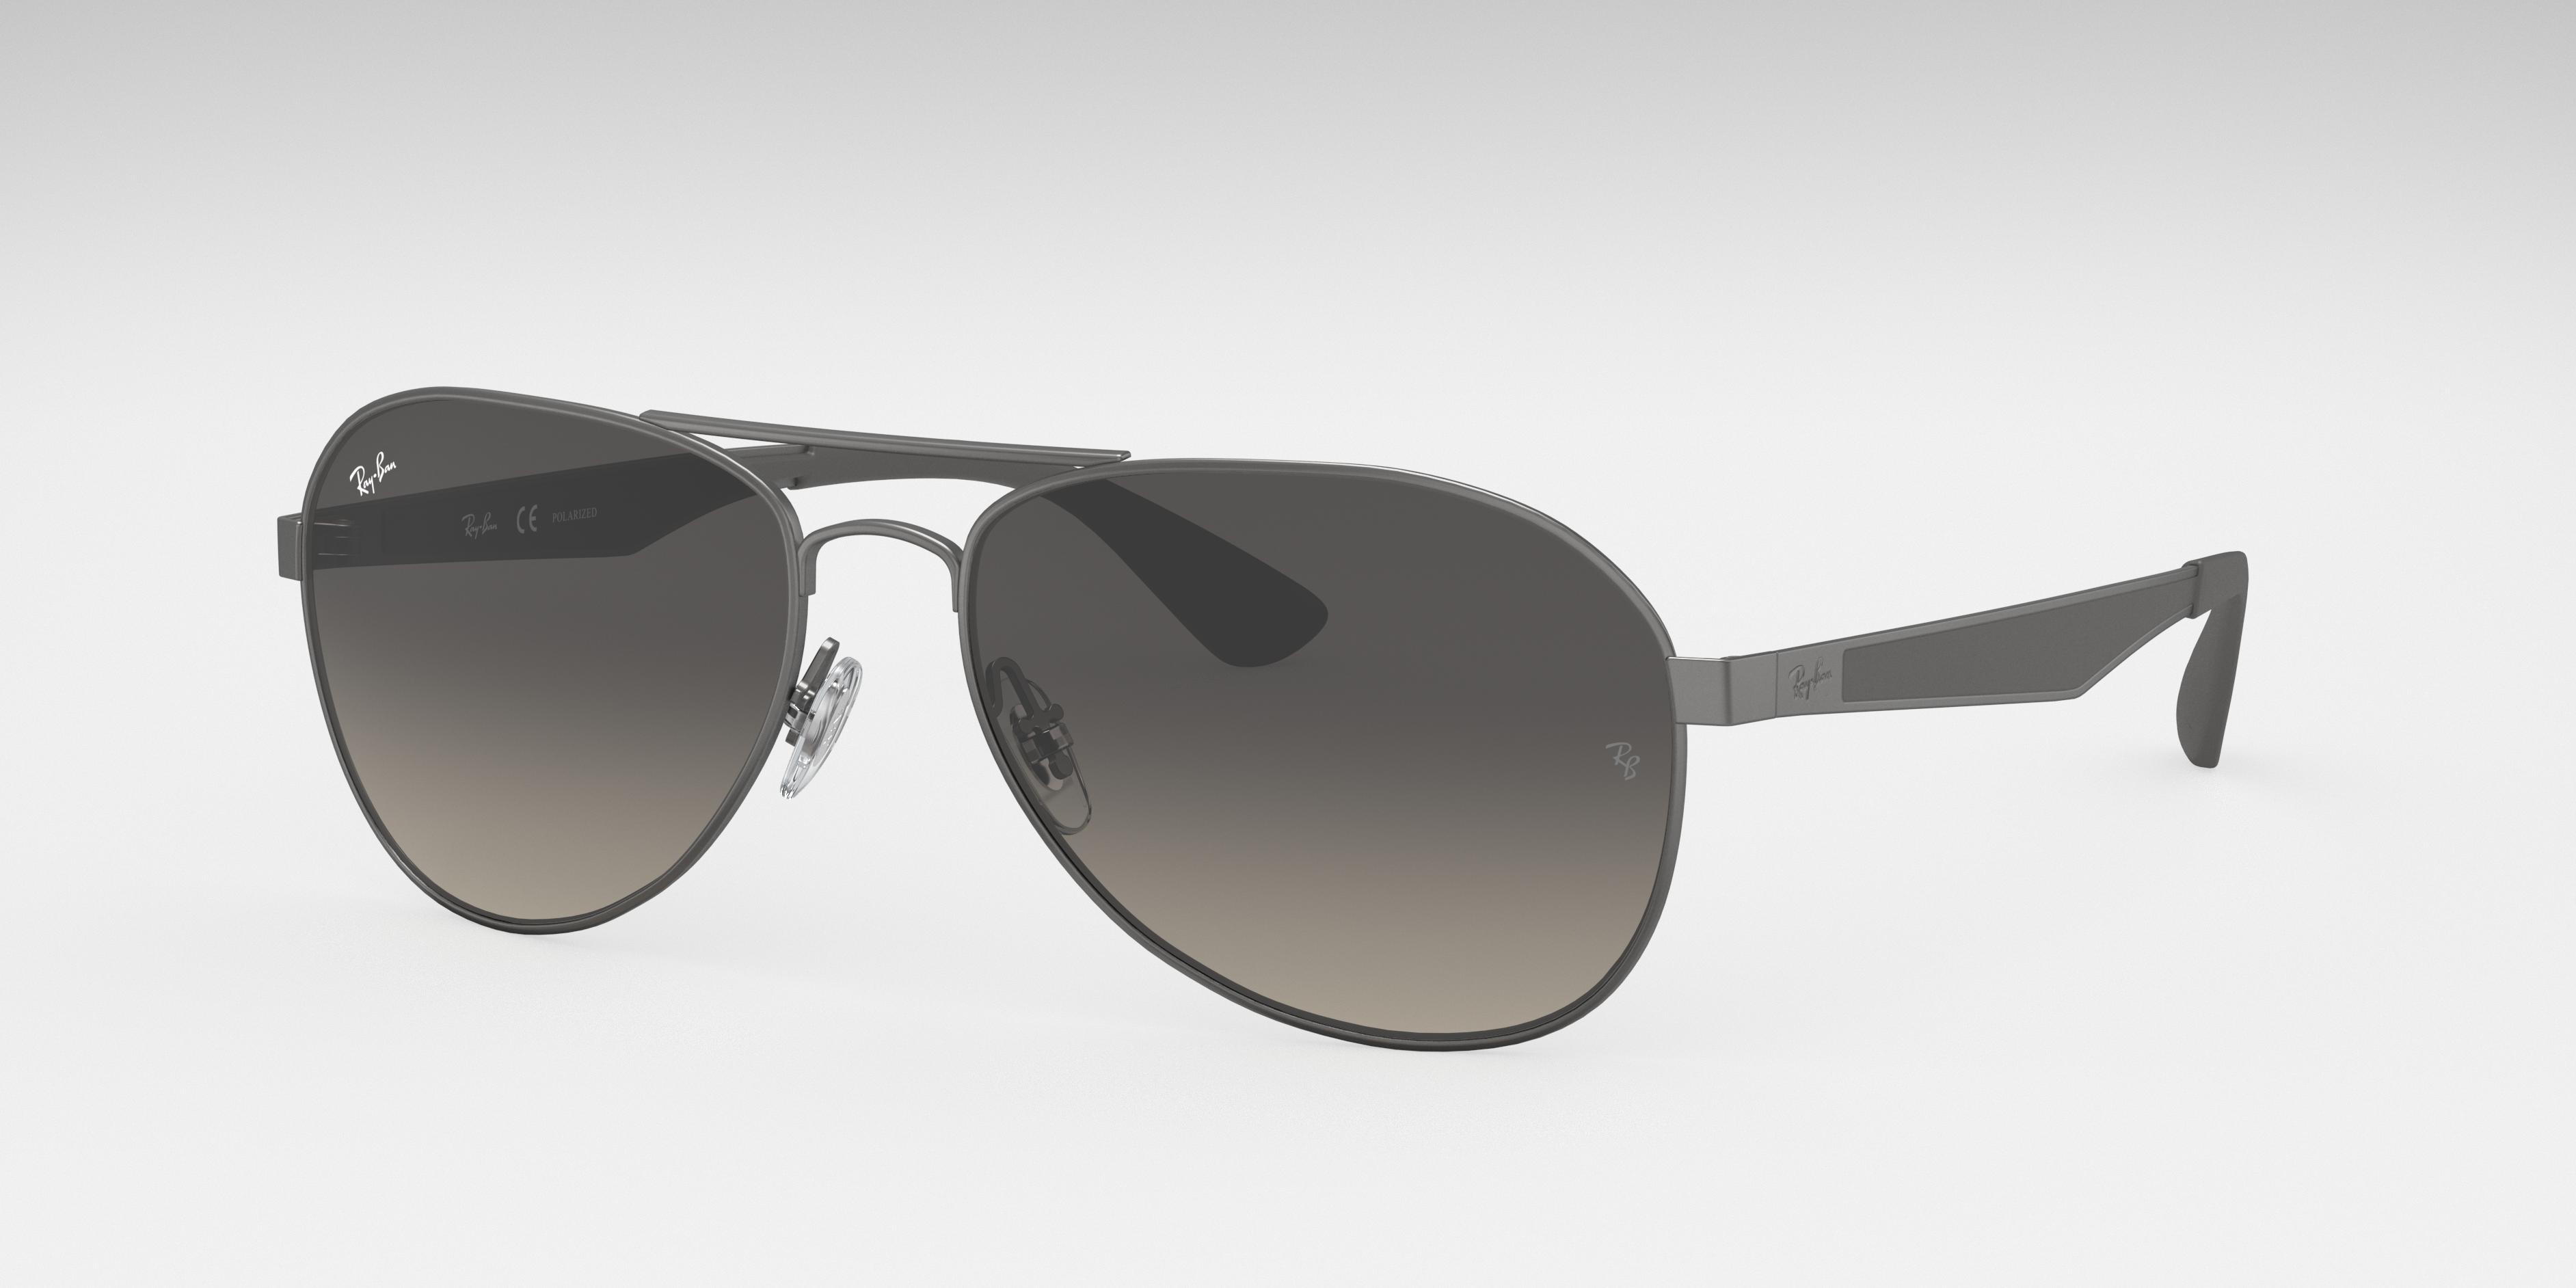 Ray-Ban Rb3549 Grey, Gray Lenses - RB3549